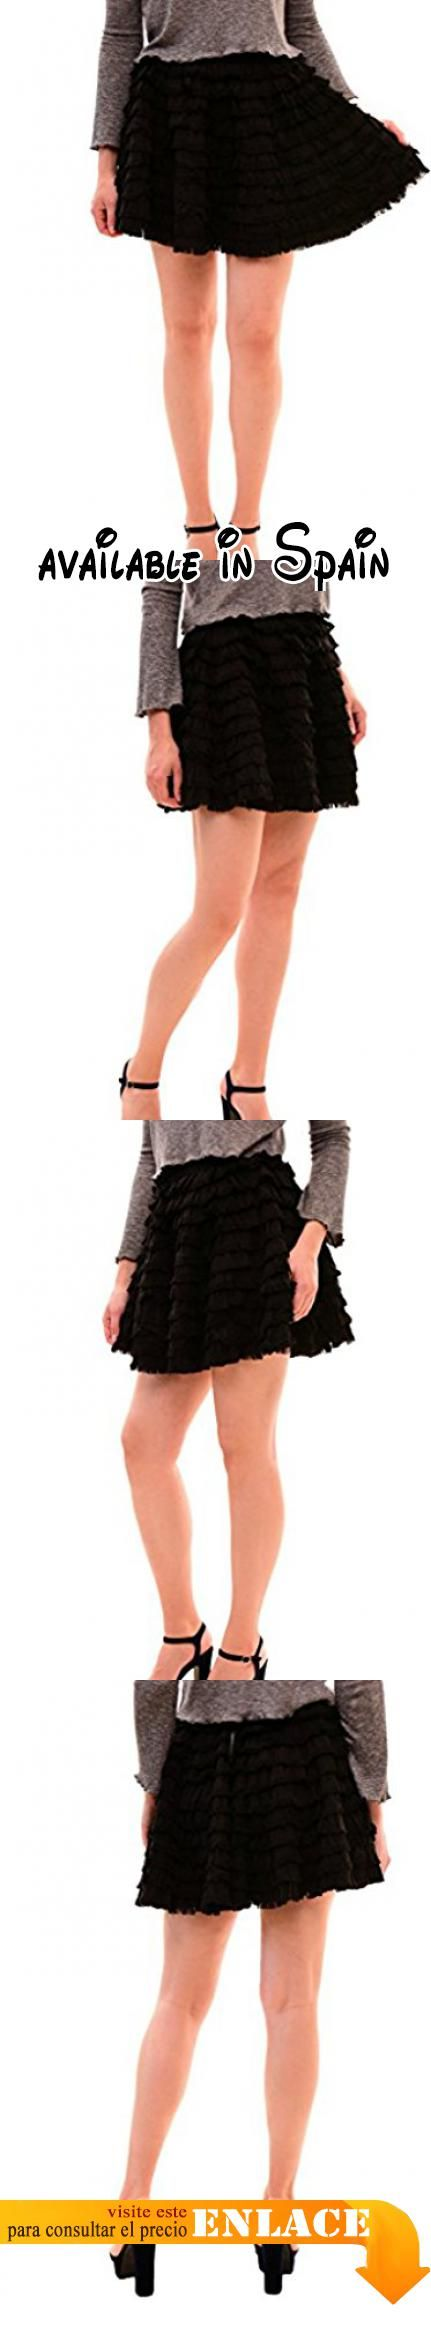 B076PR9P8R : Diesel - Falda - falda tubo - para mujer negro XS .